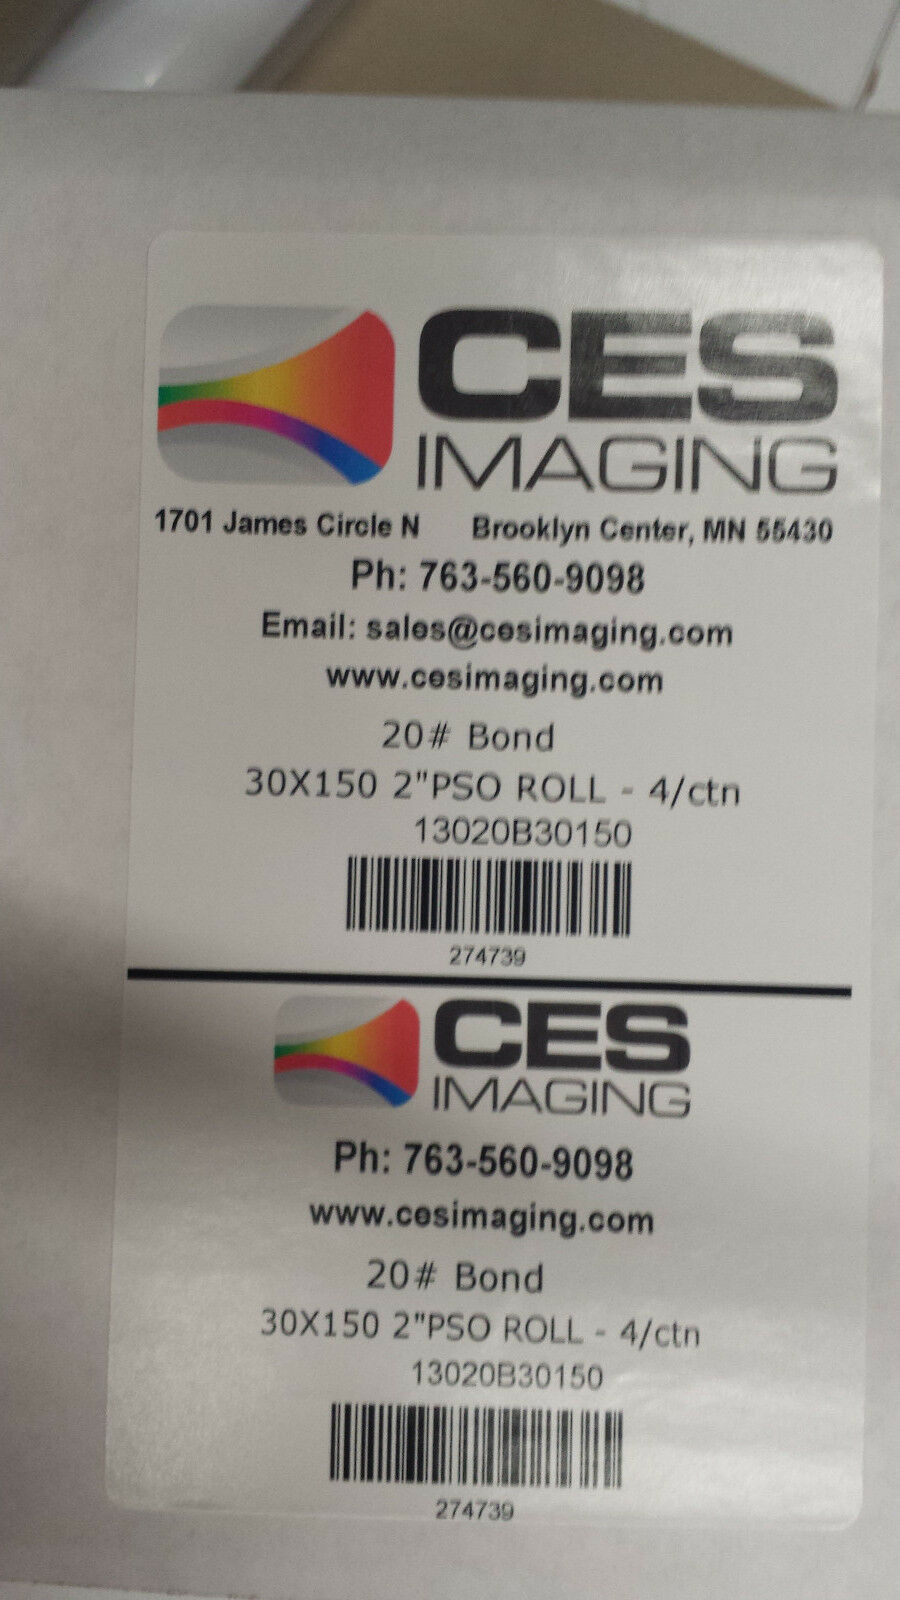 4 Rolls 30 x150' 20lb Bond HP DesignJet Plotter Paper